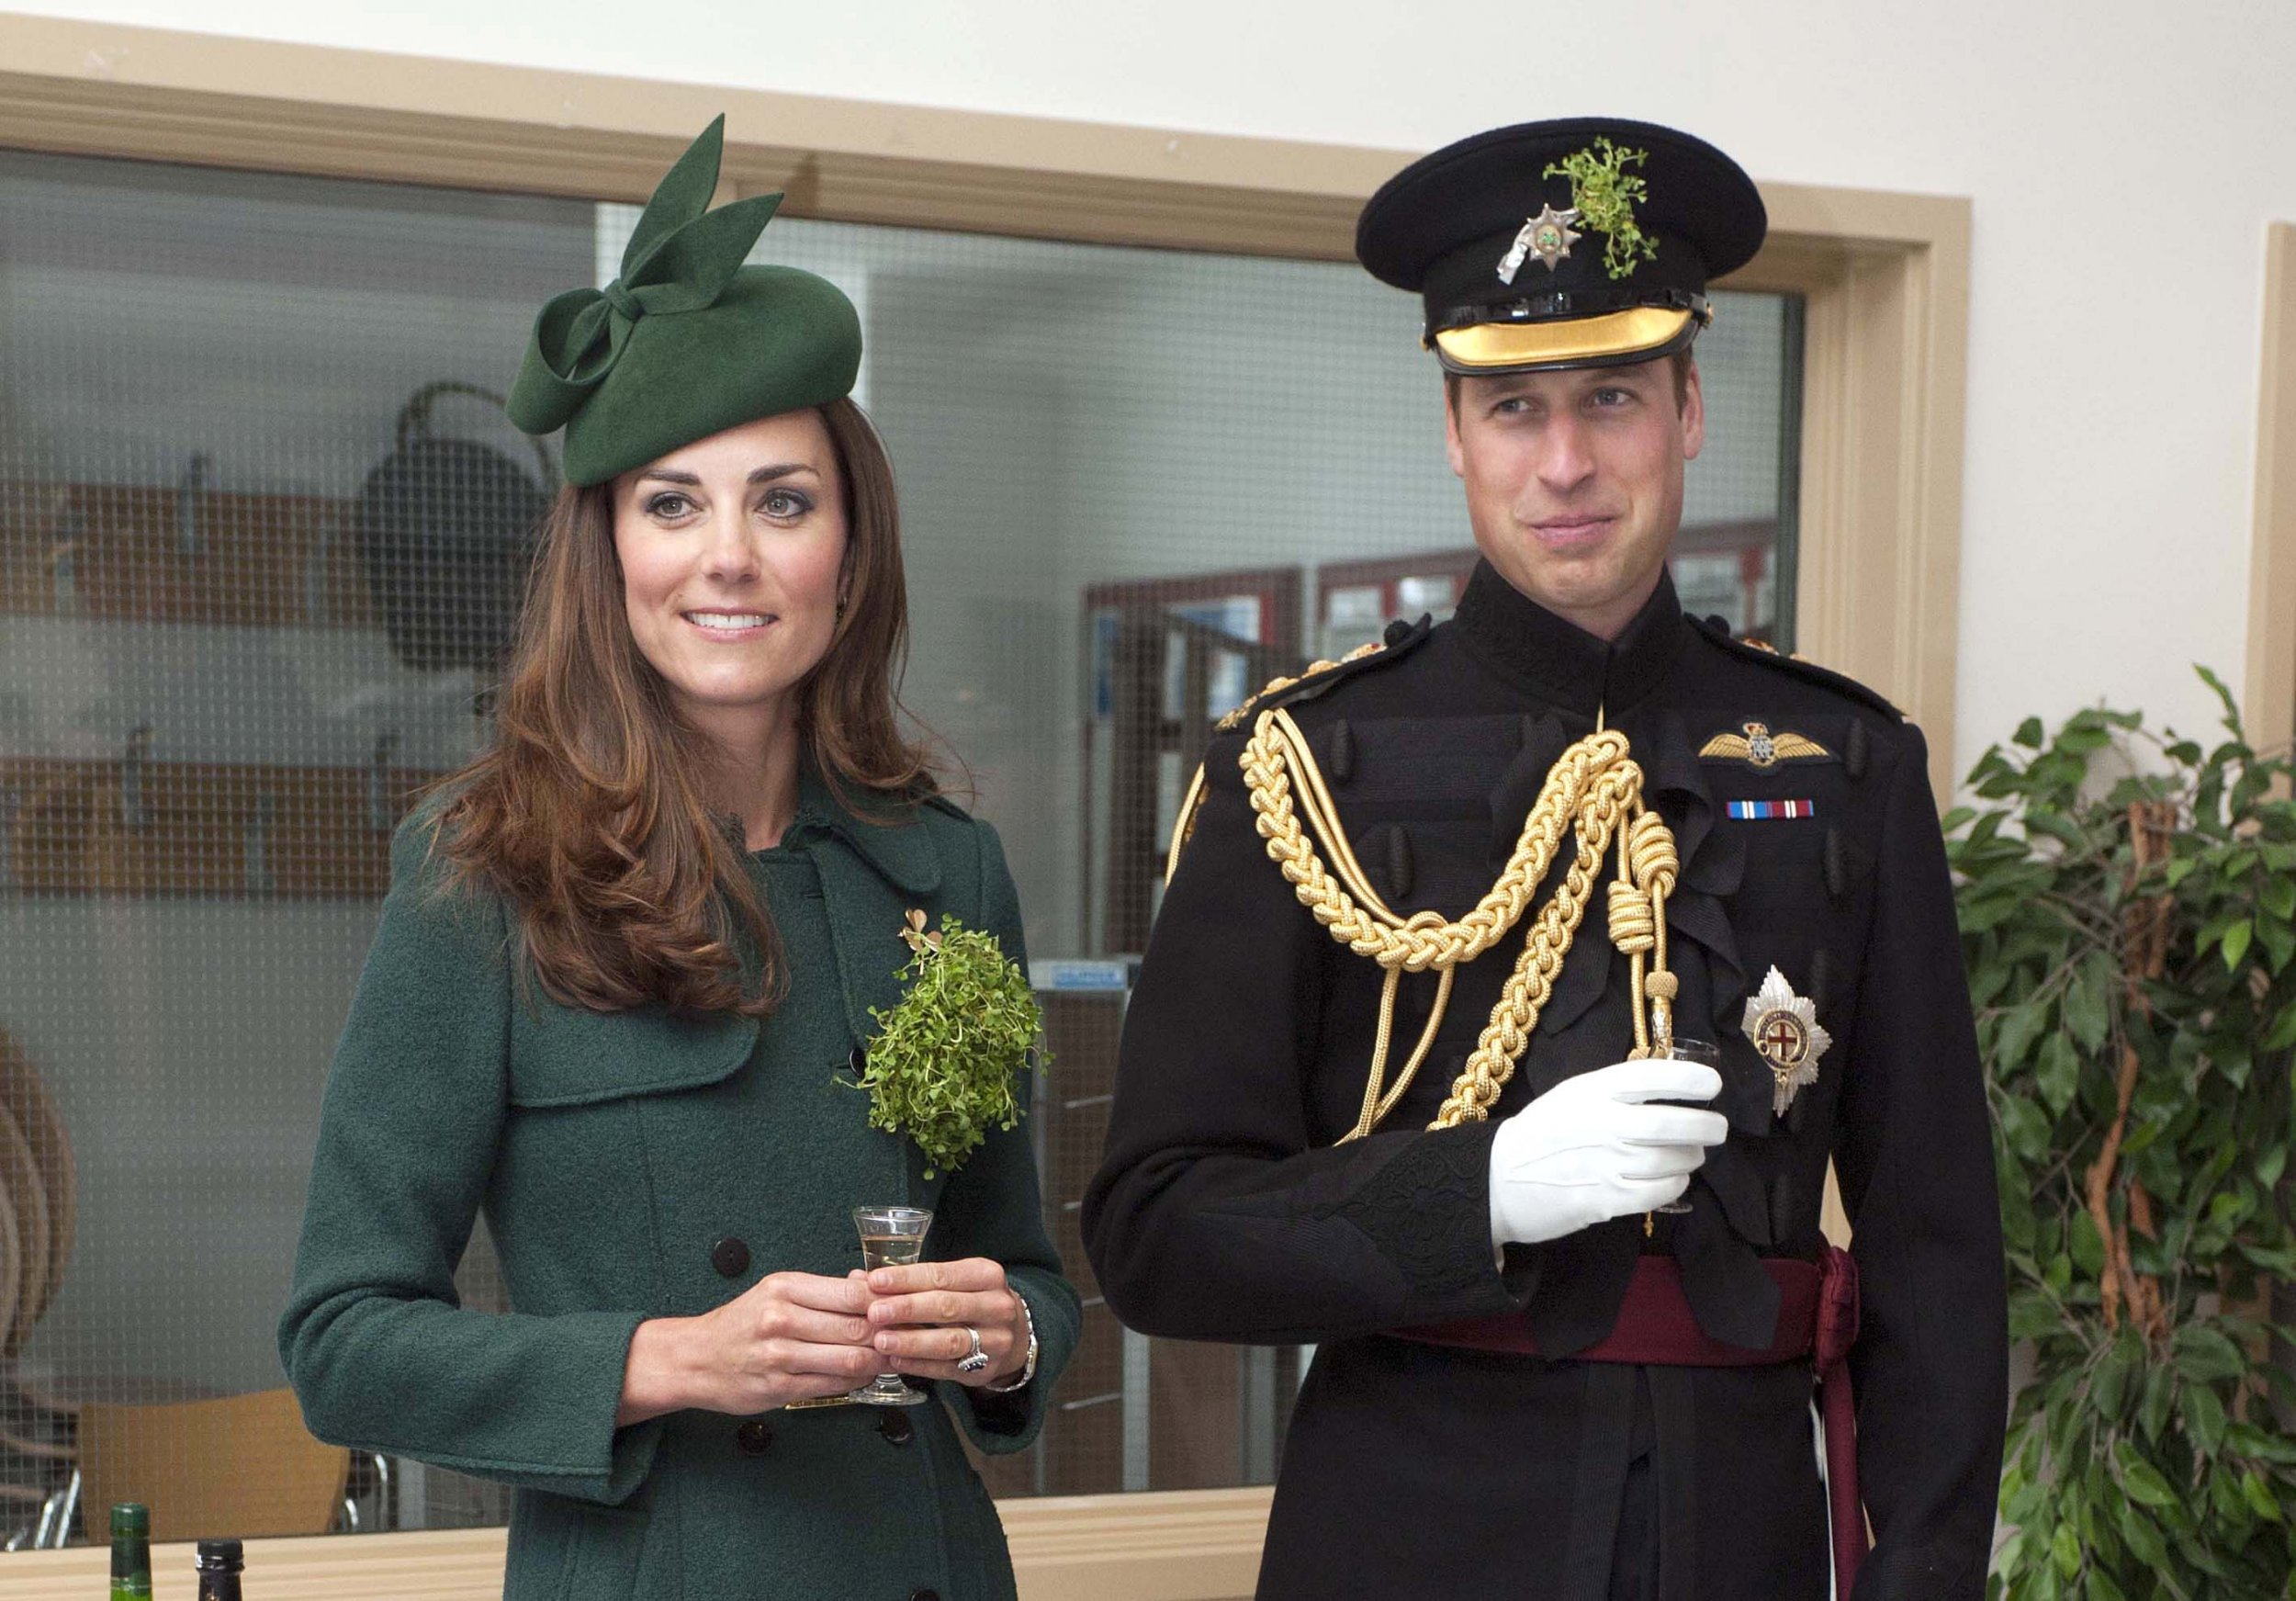 Prince William Catherine